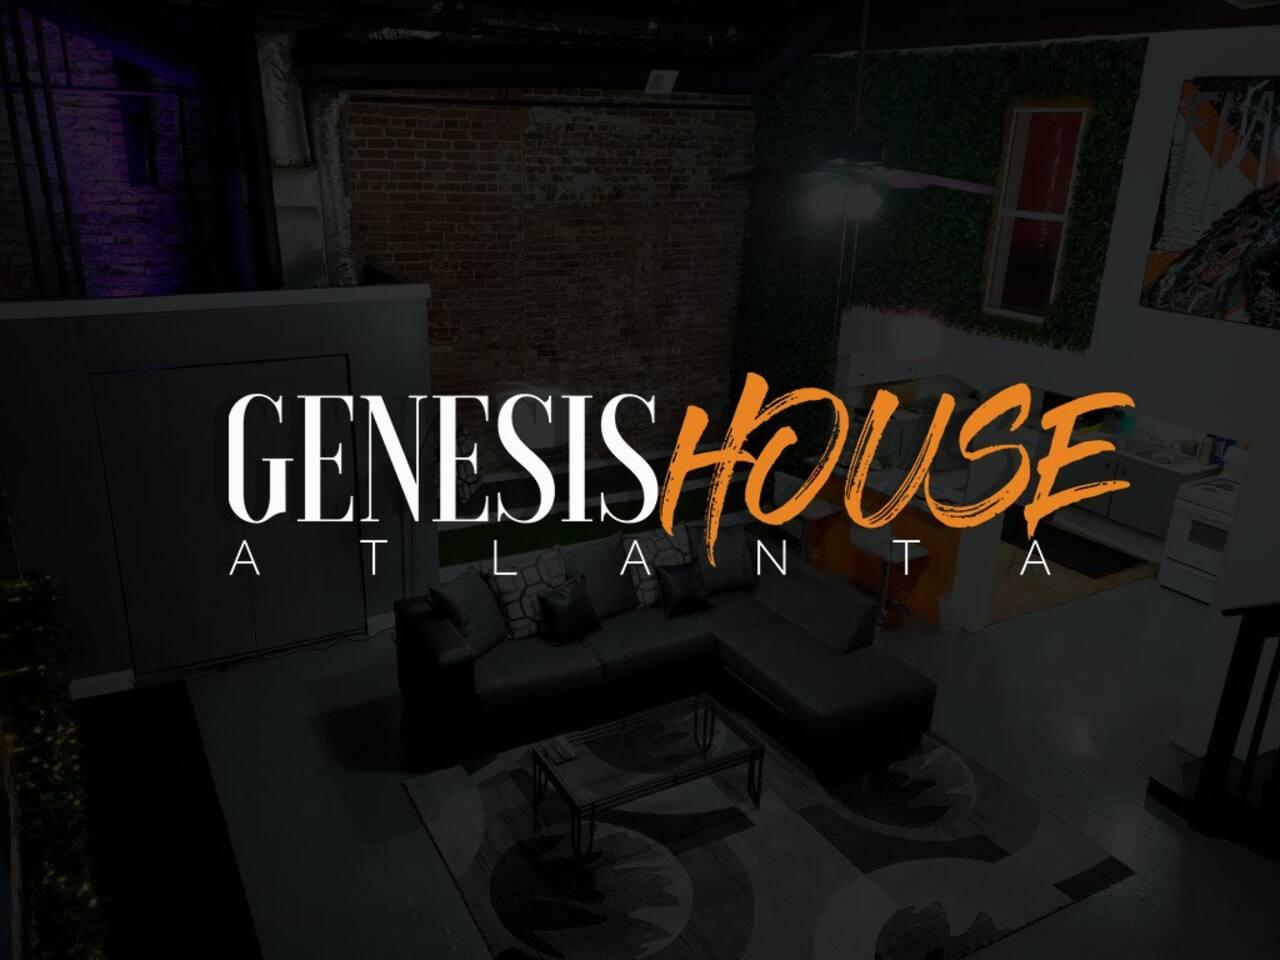 Genesis House Atlanta